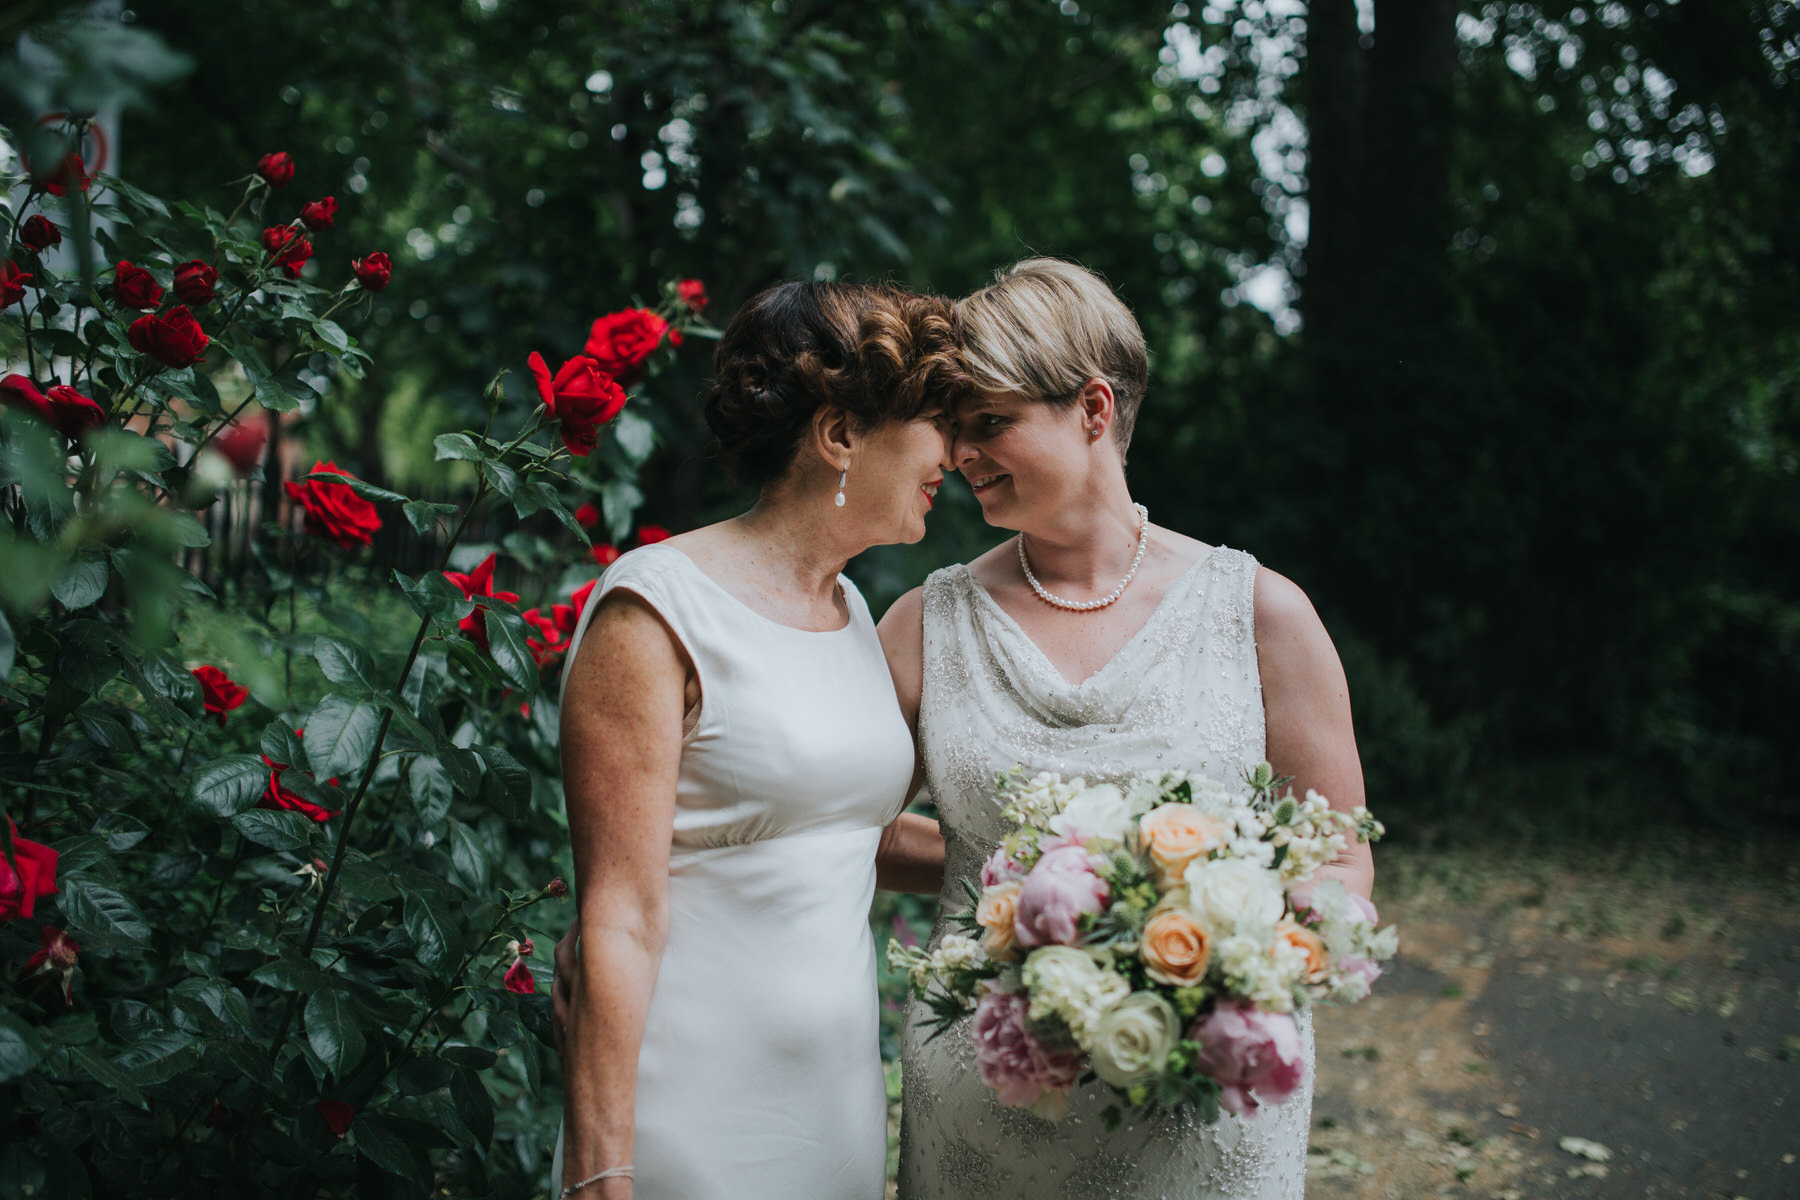 194 touching forehead two brides wedding portraits London reportage.jpg